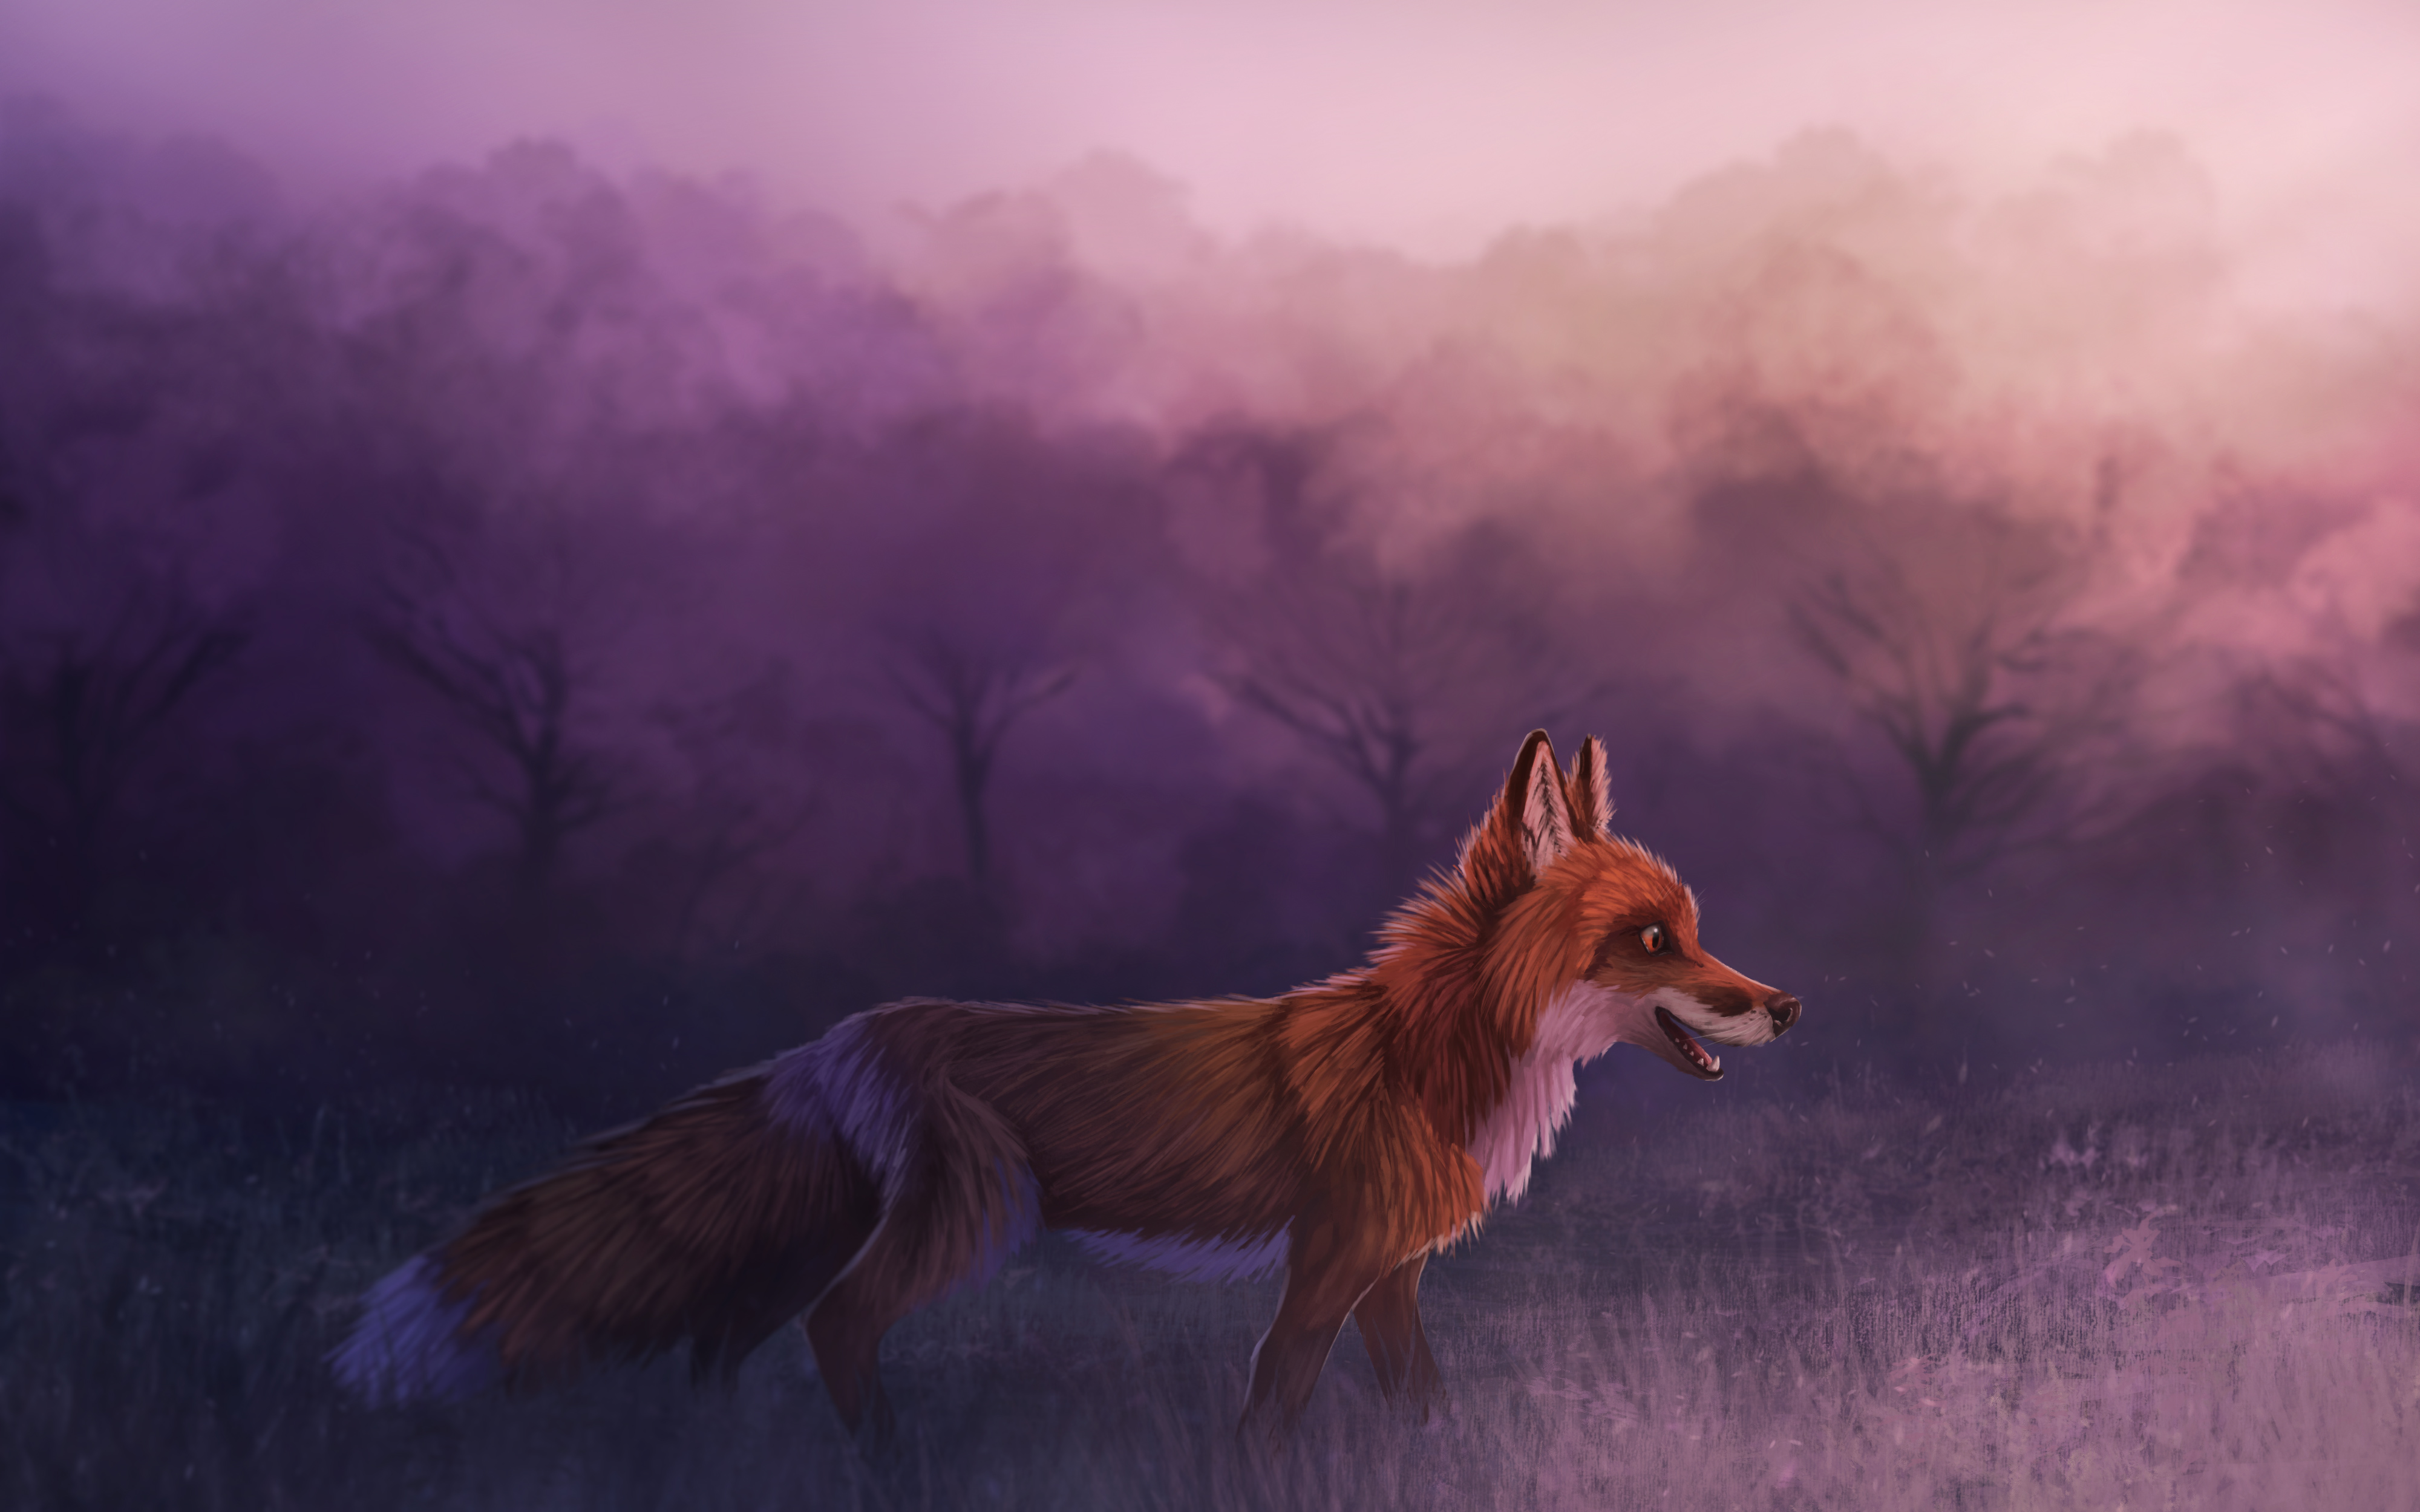 misty red fox 1574937969 - Misty Red Fox -